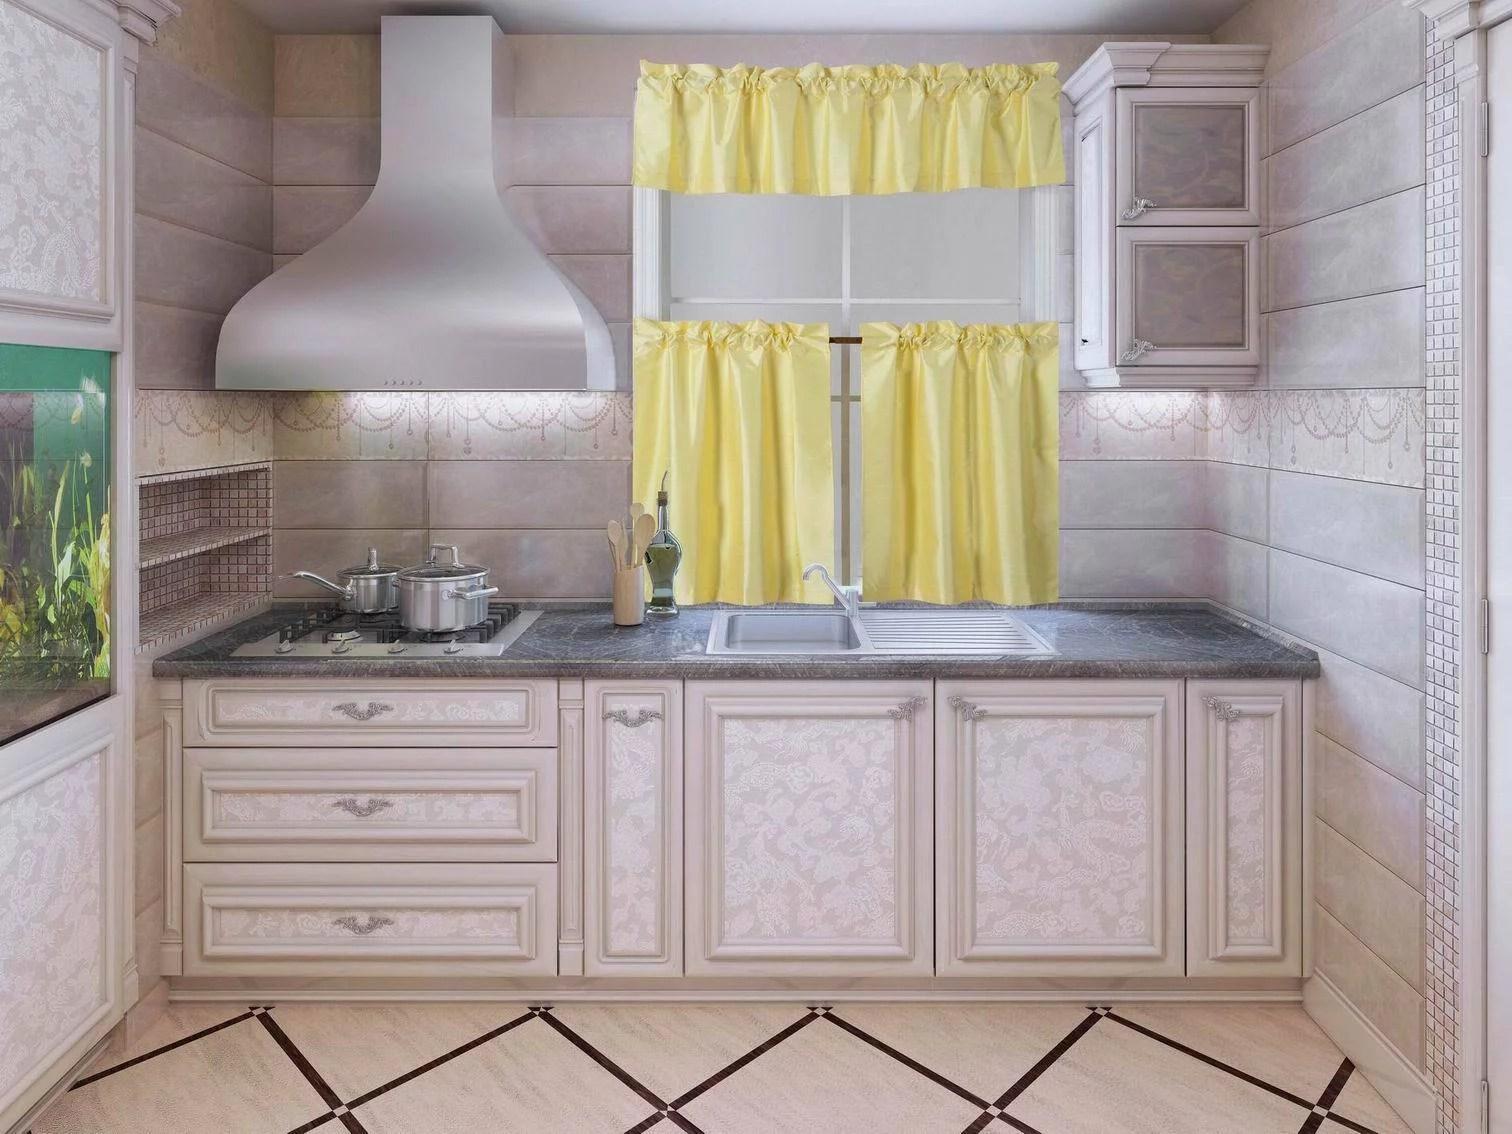 k3 yellow 3 piece blackout rod pocket kitchen window curtain set darkening tier panels treatment with matching valance